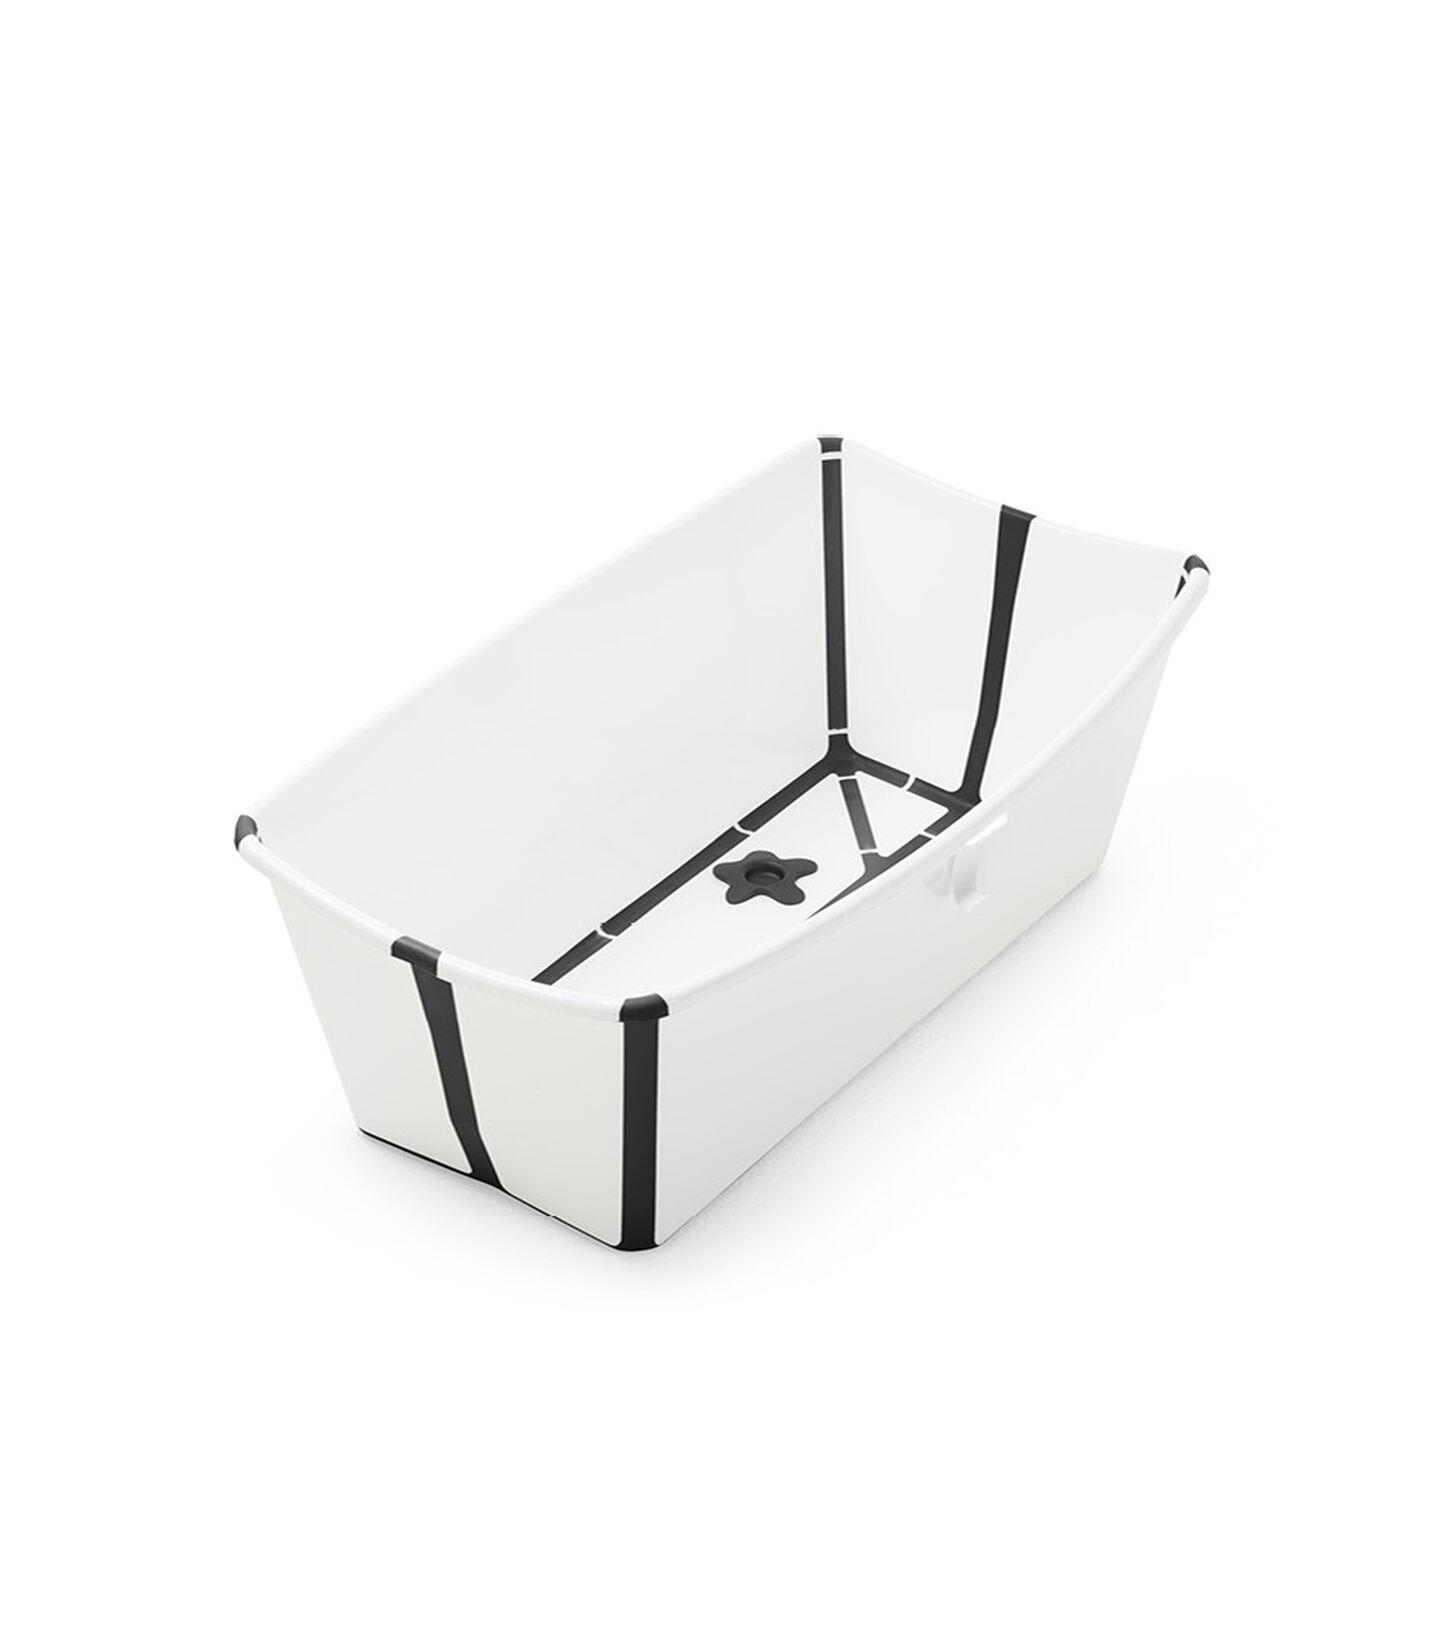 Stokke® Flexi Bath® bath tub, White Black Limited Edition.